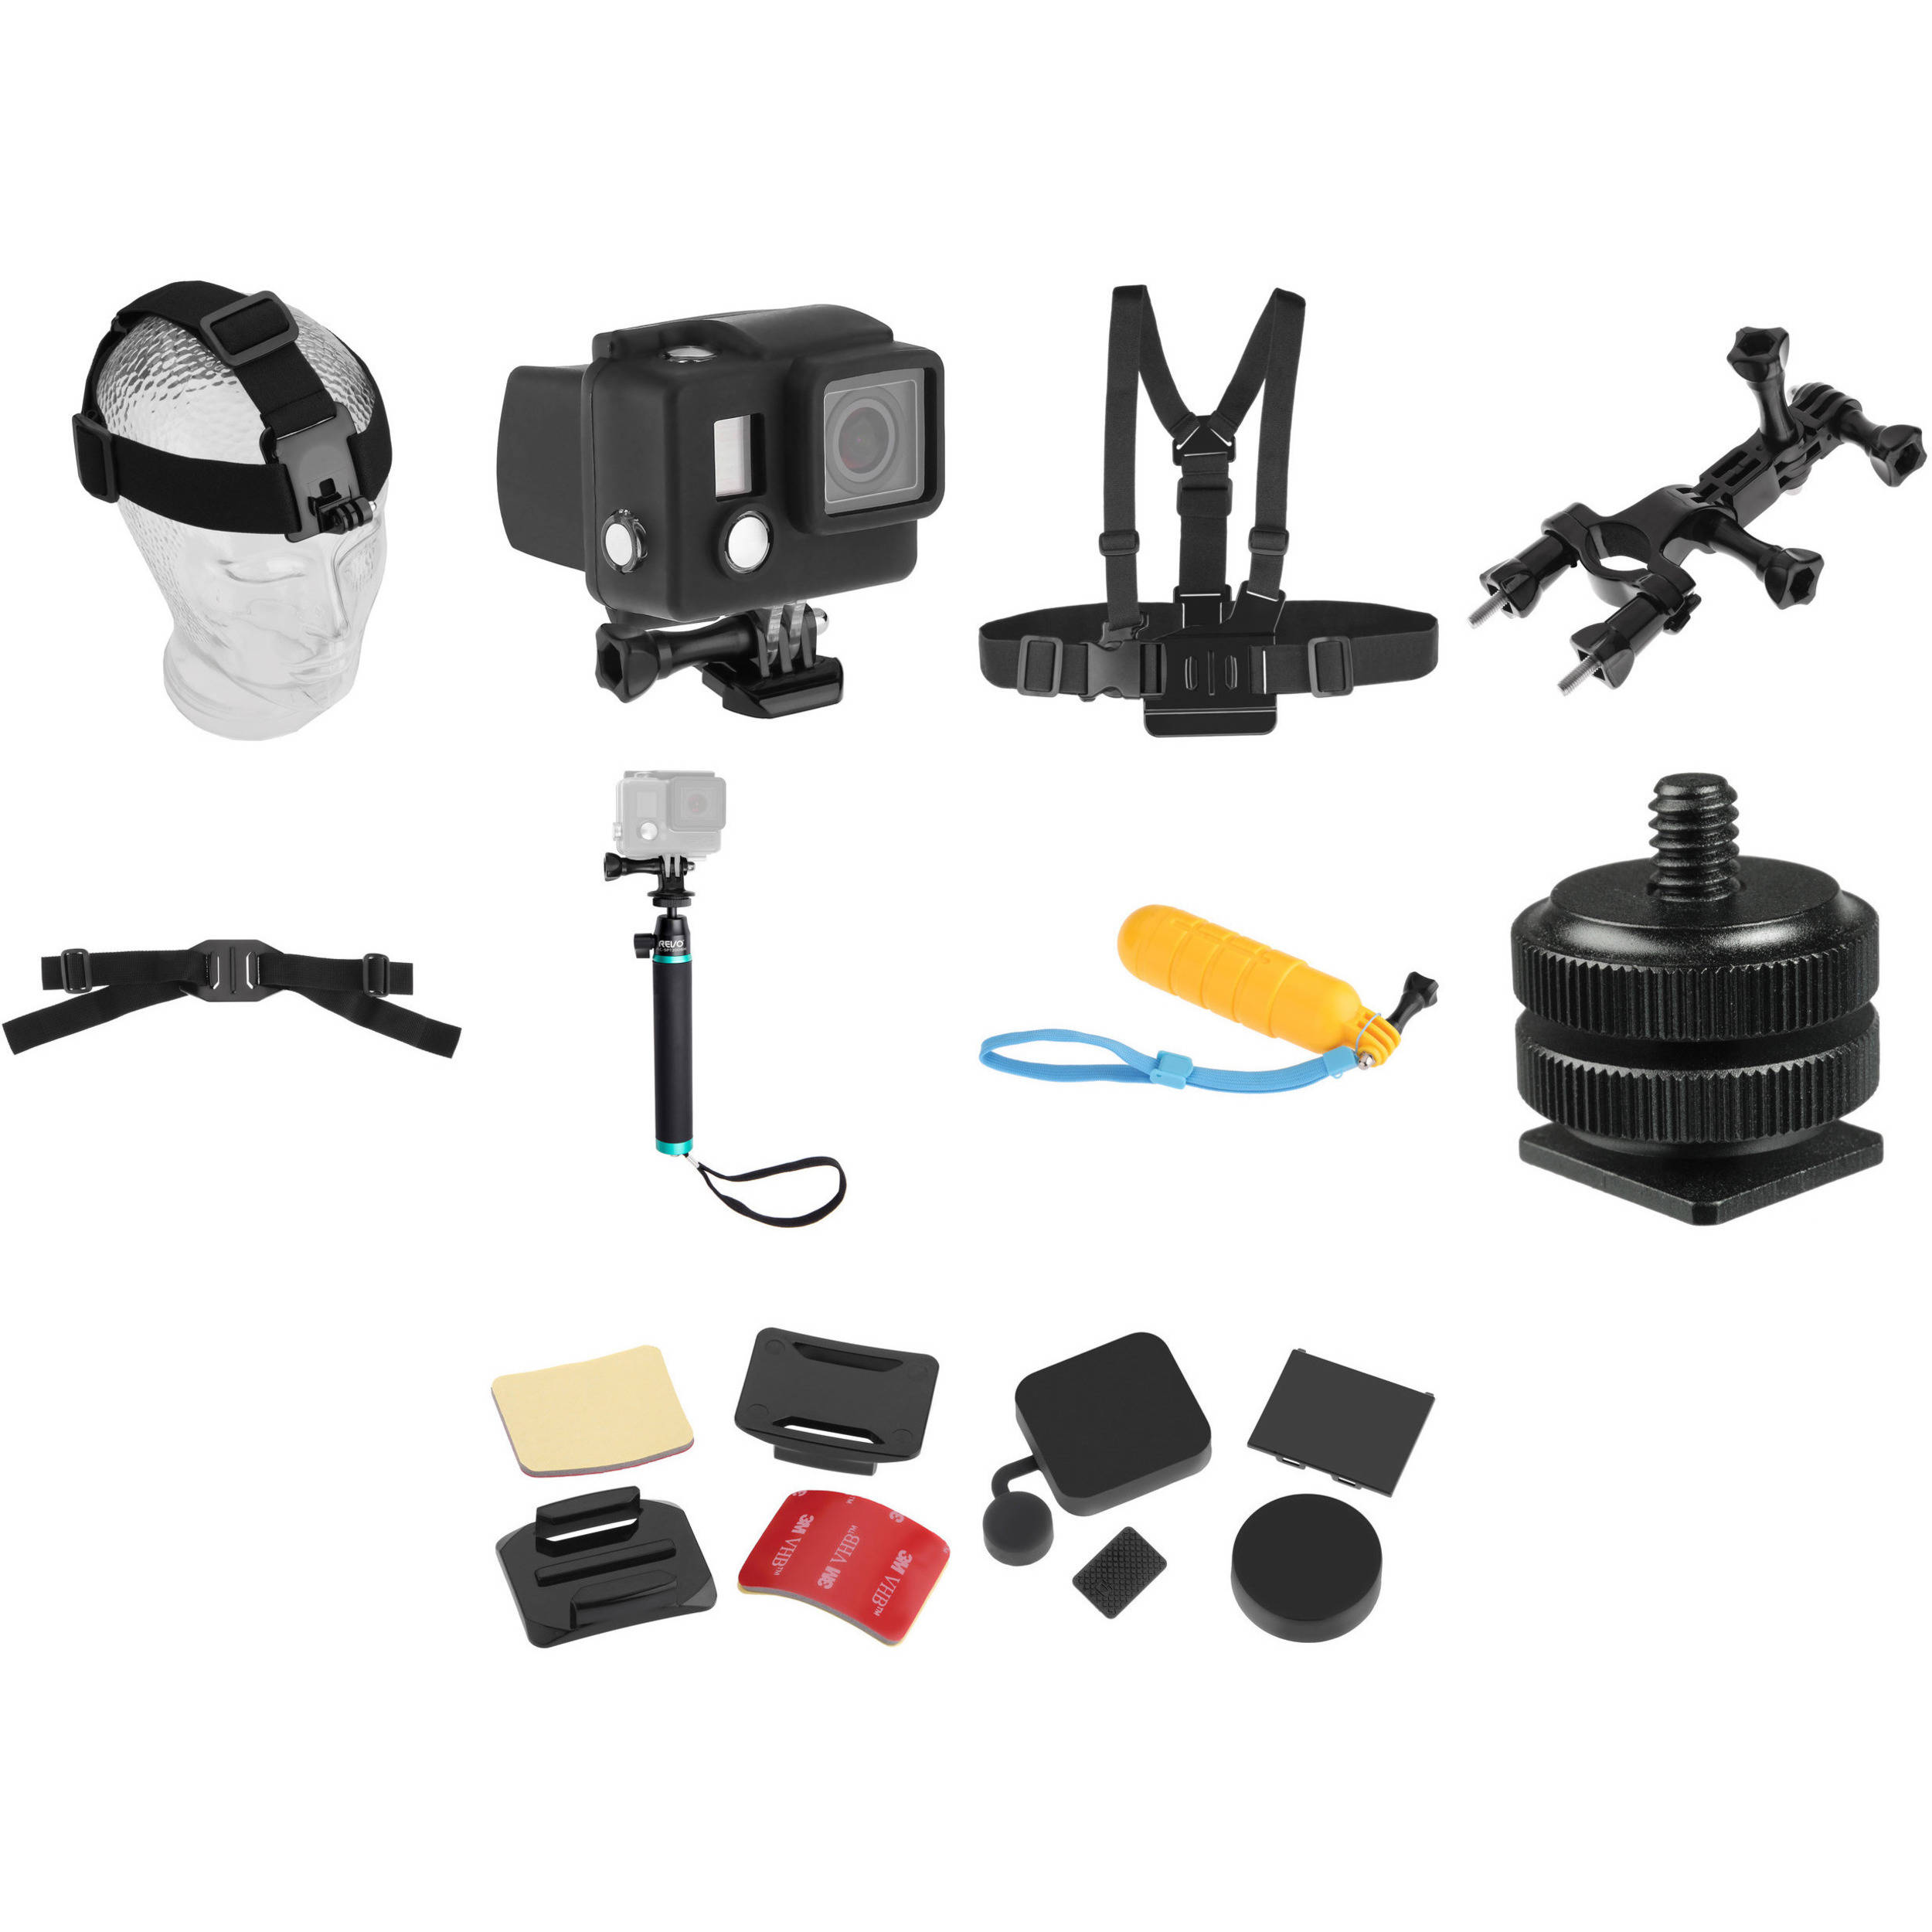 Revo Maximum Boost 10-Piece Accessory Kit for GoPro